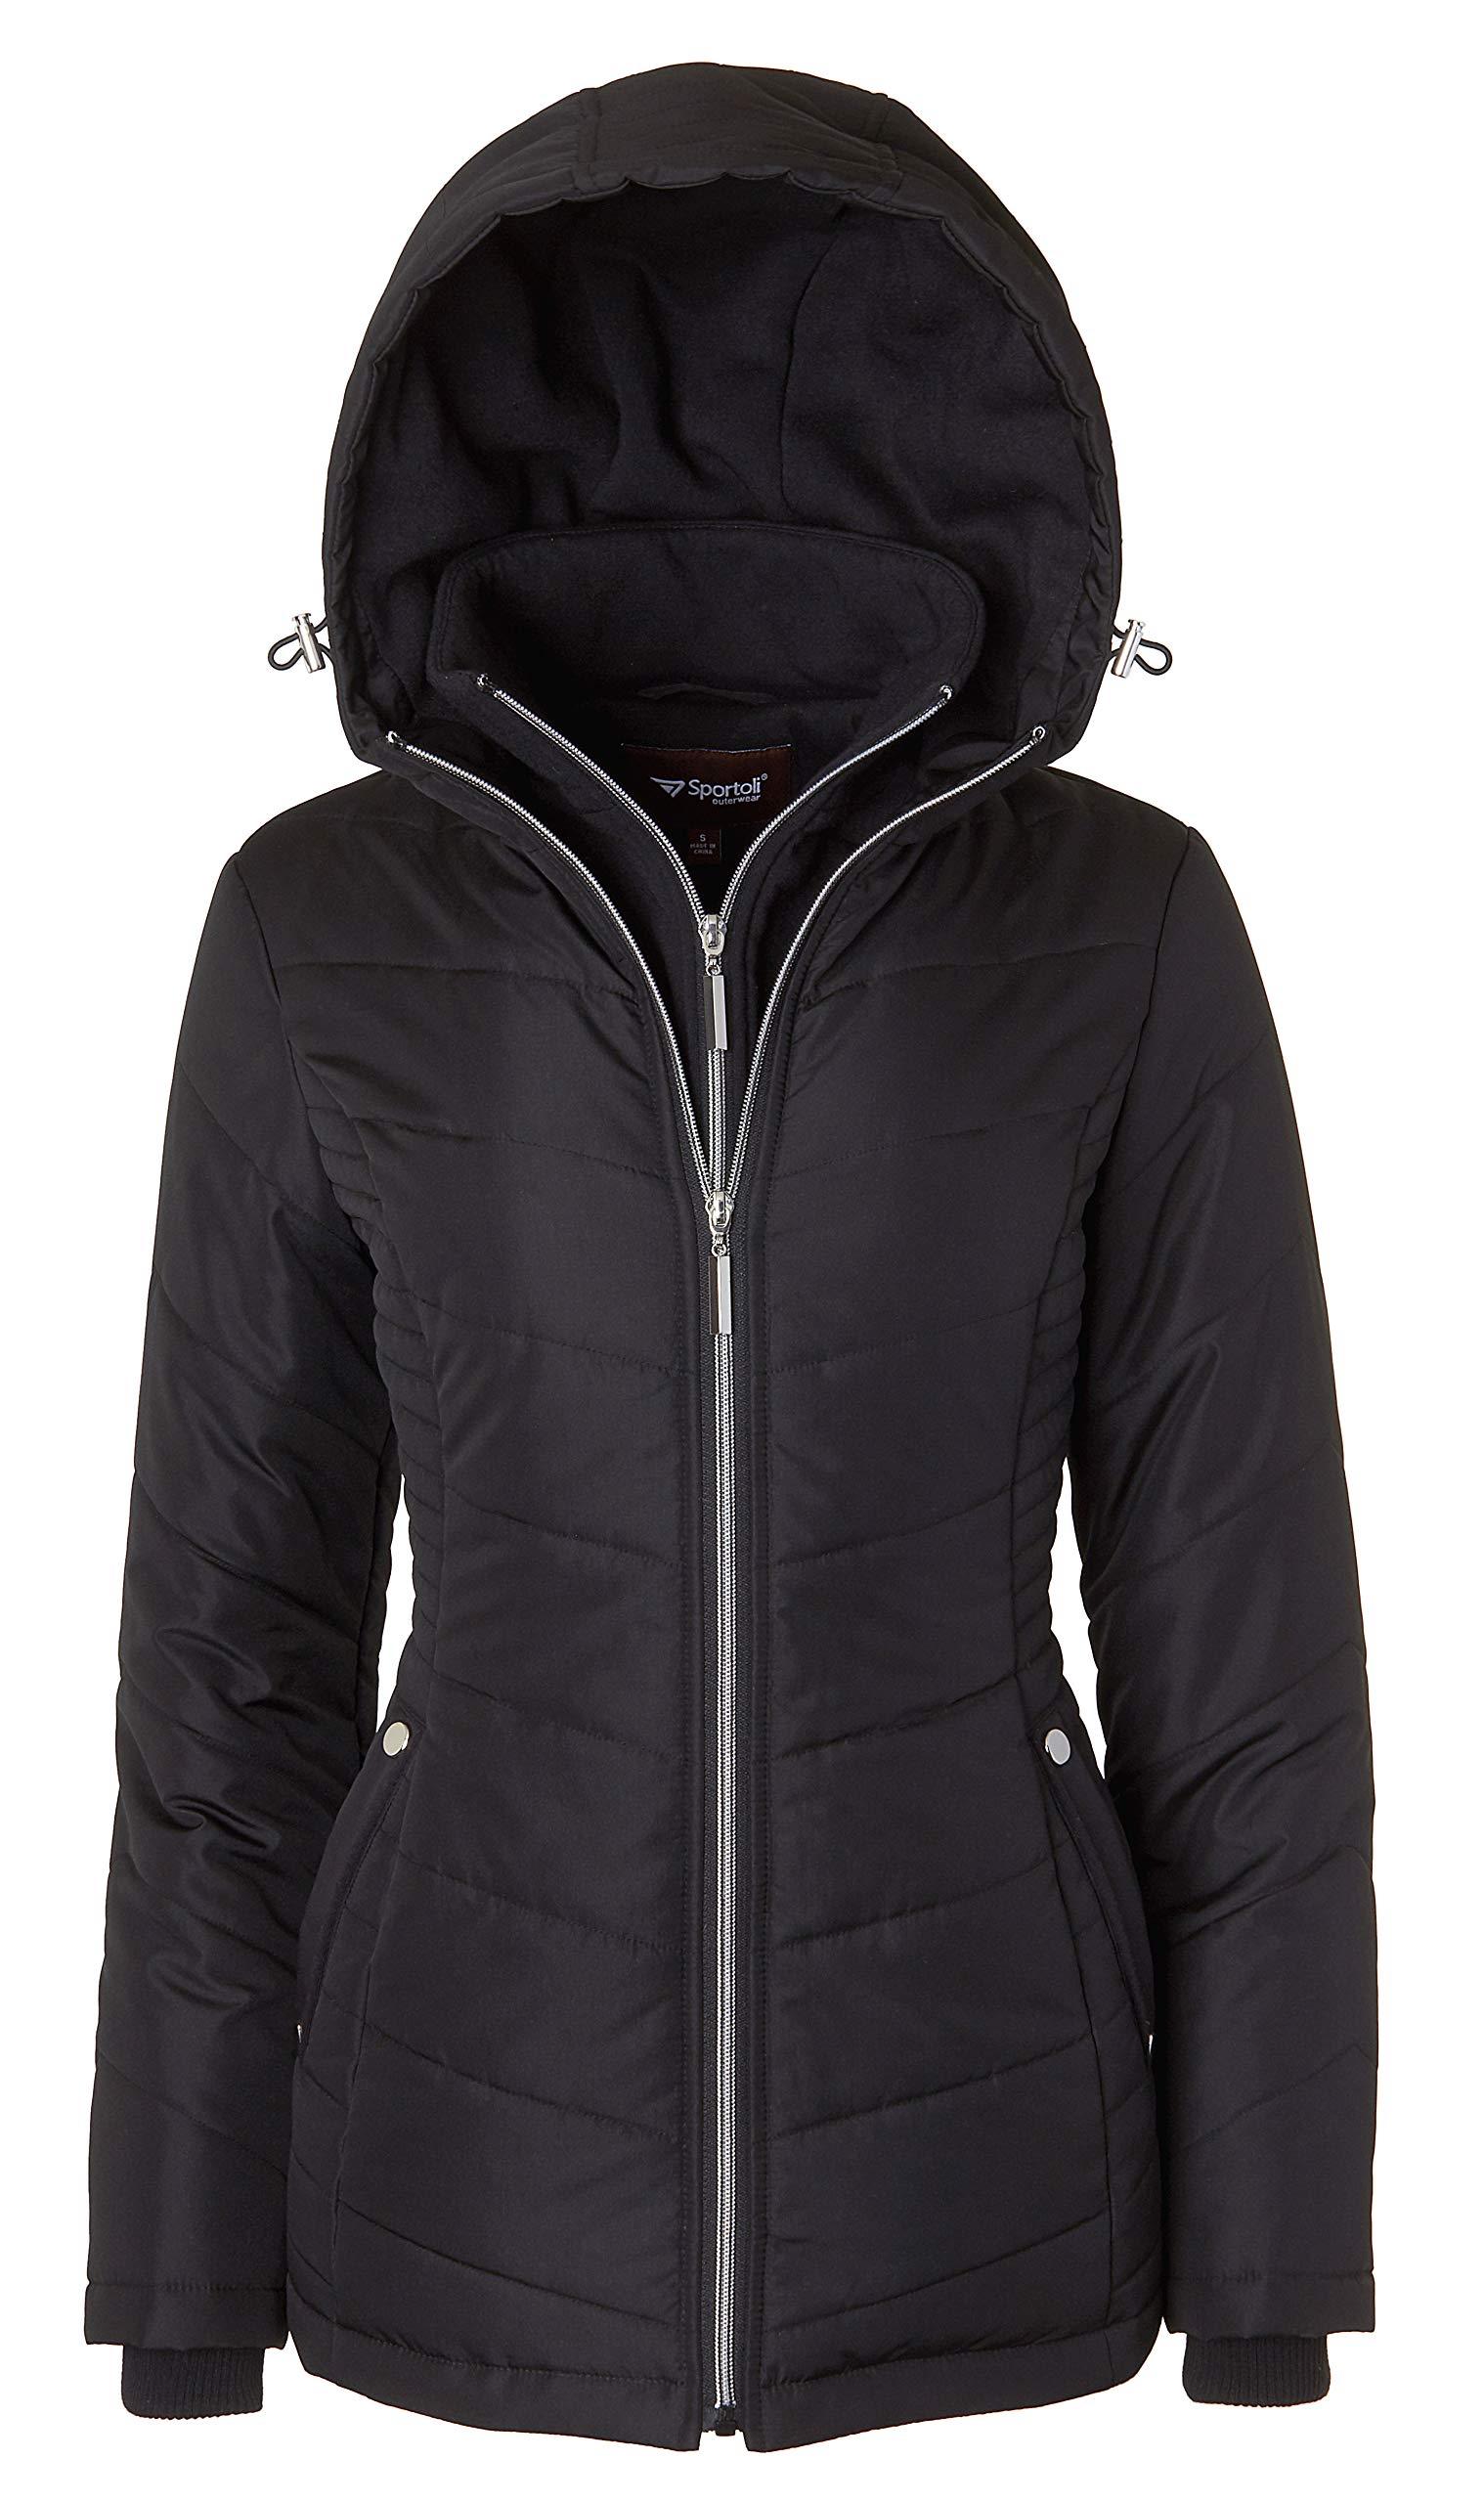 Women's Down Alternative Quilted Midlength Vestee Puffer Jacket with Fleece Hood - Black (Medium)